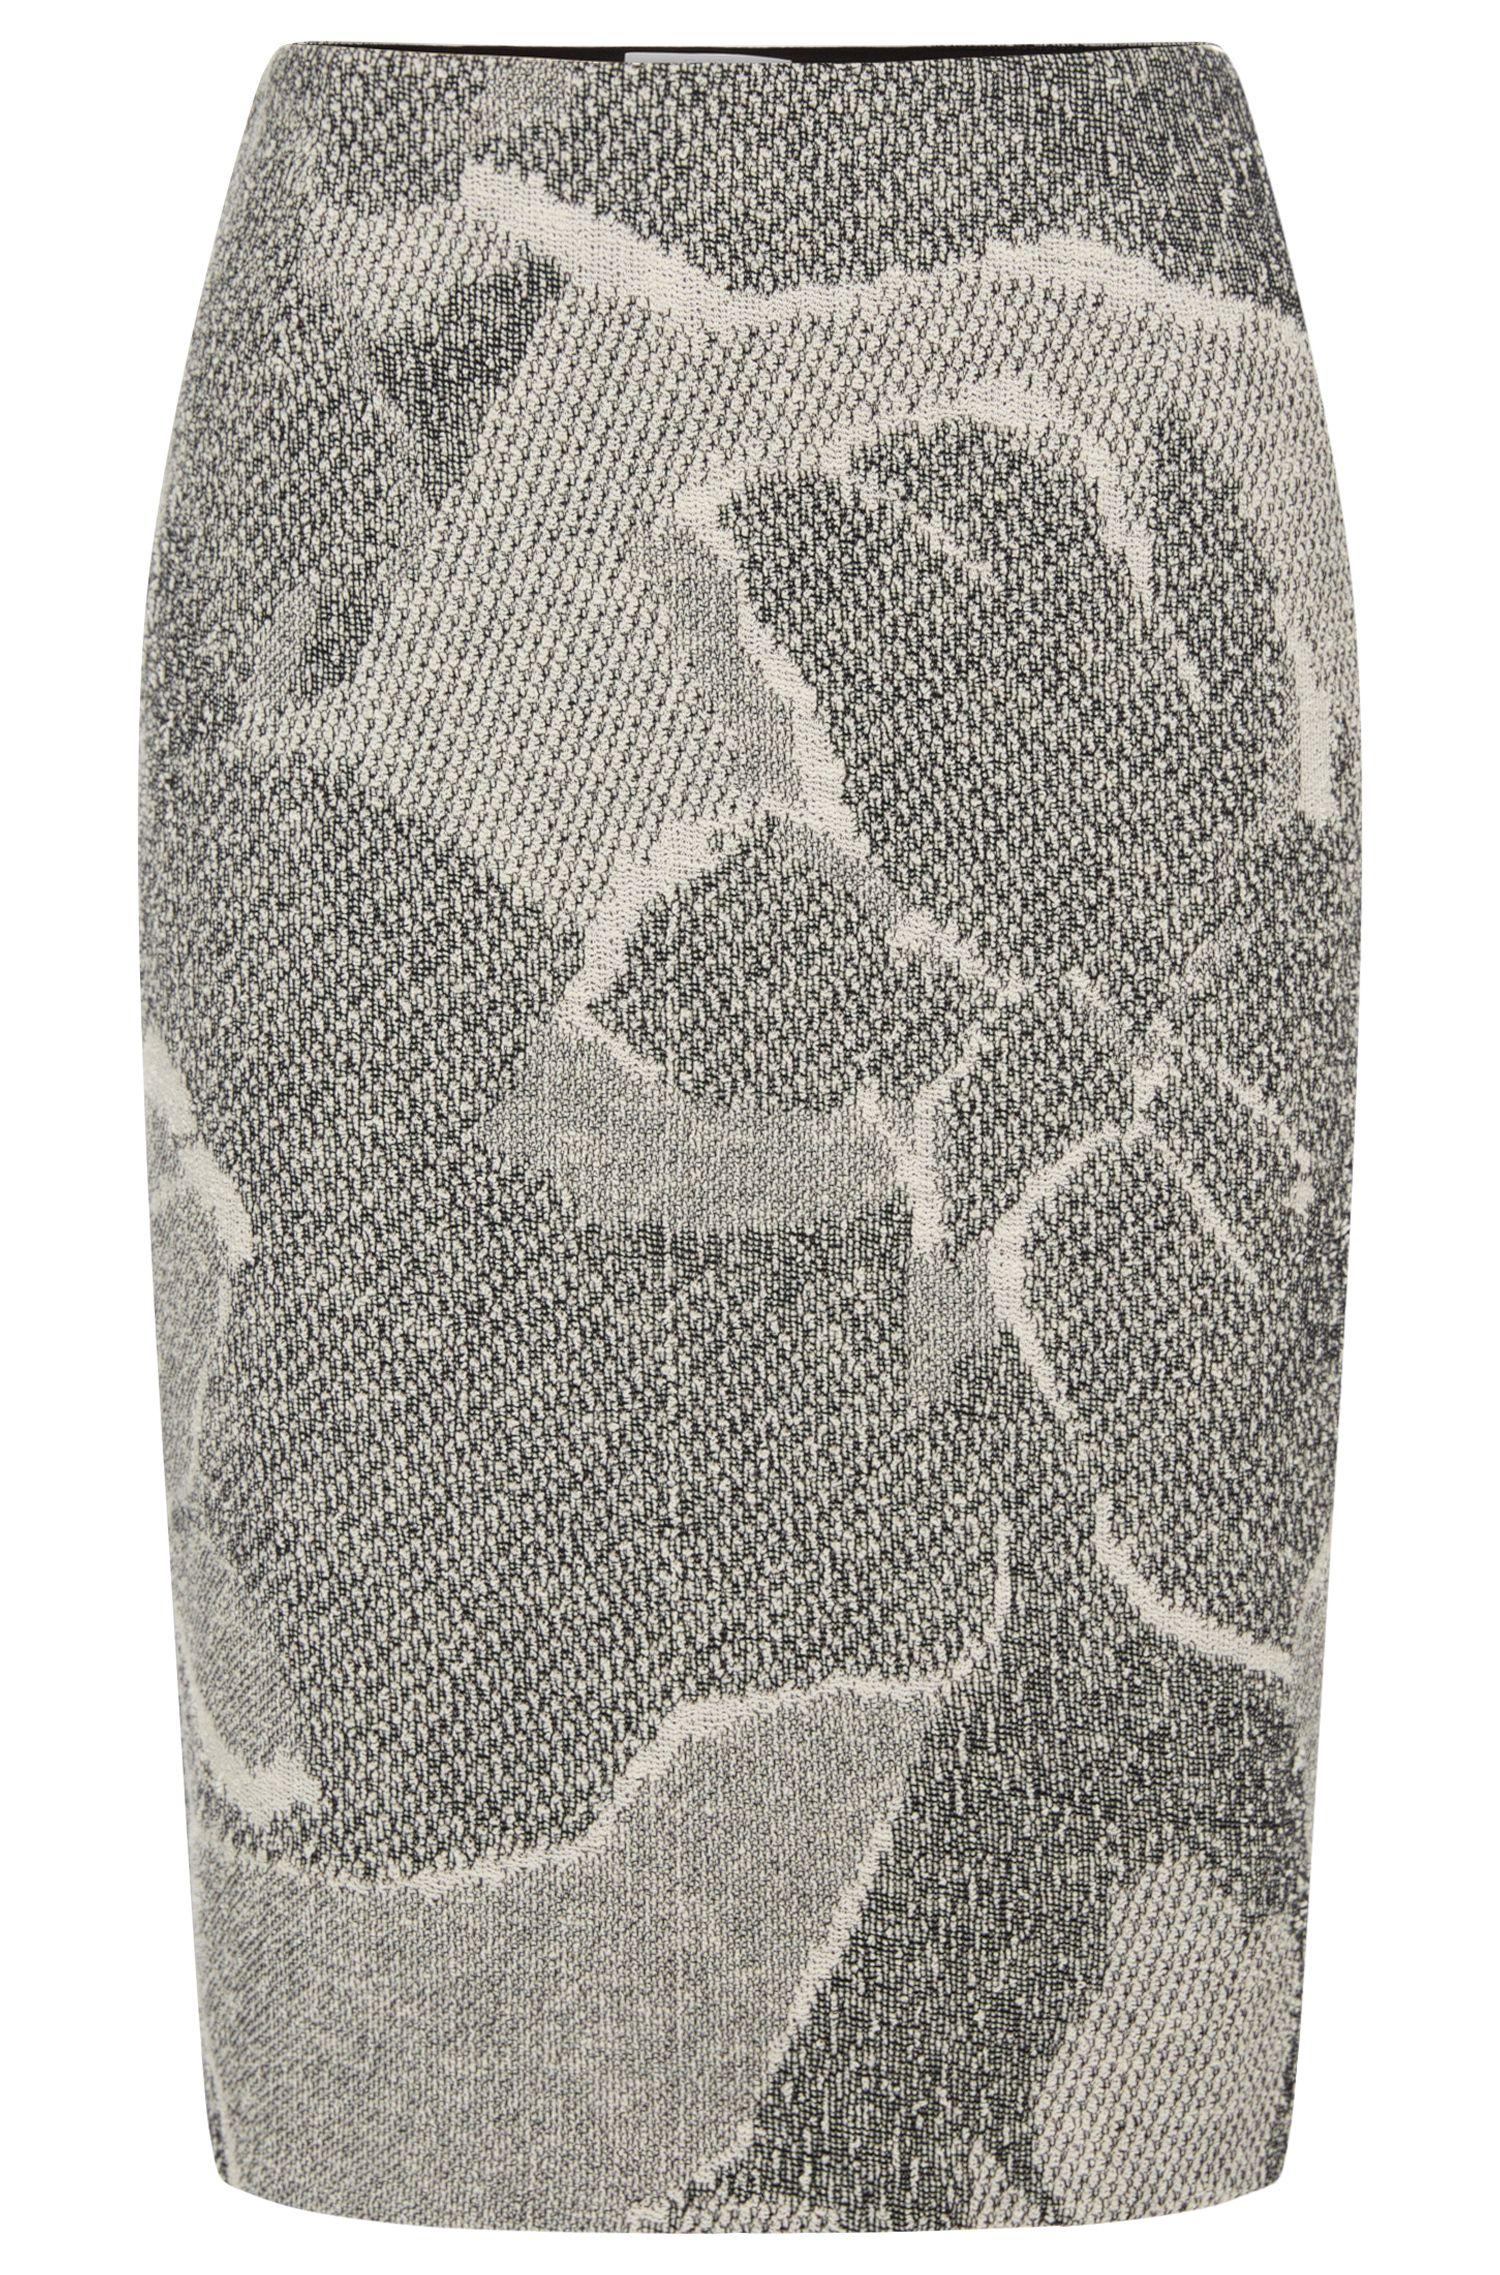 'Marala'   Cotton Blend Jacquard Floral Boucle Skirt